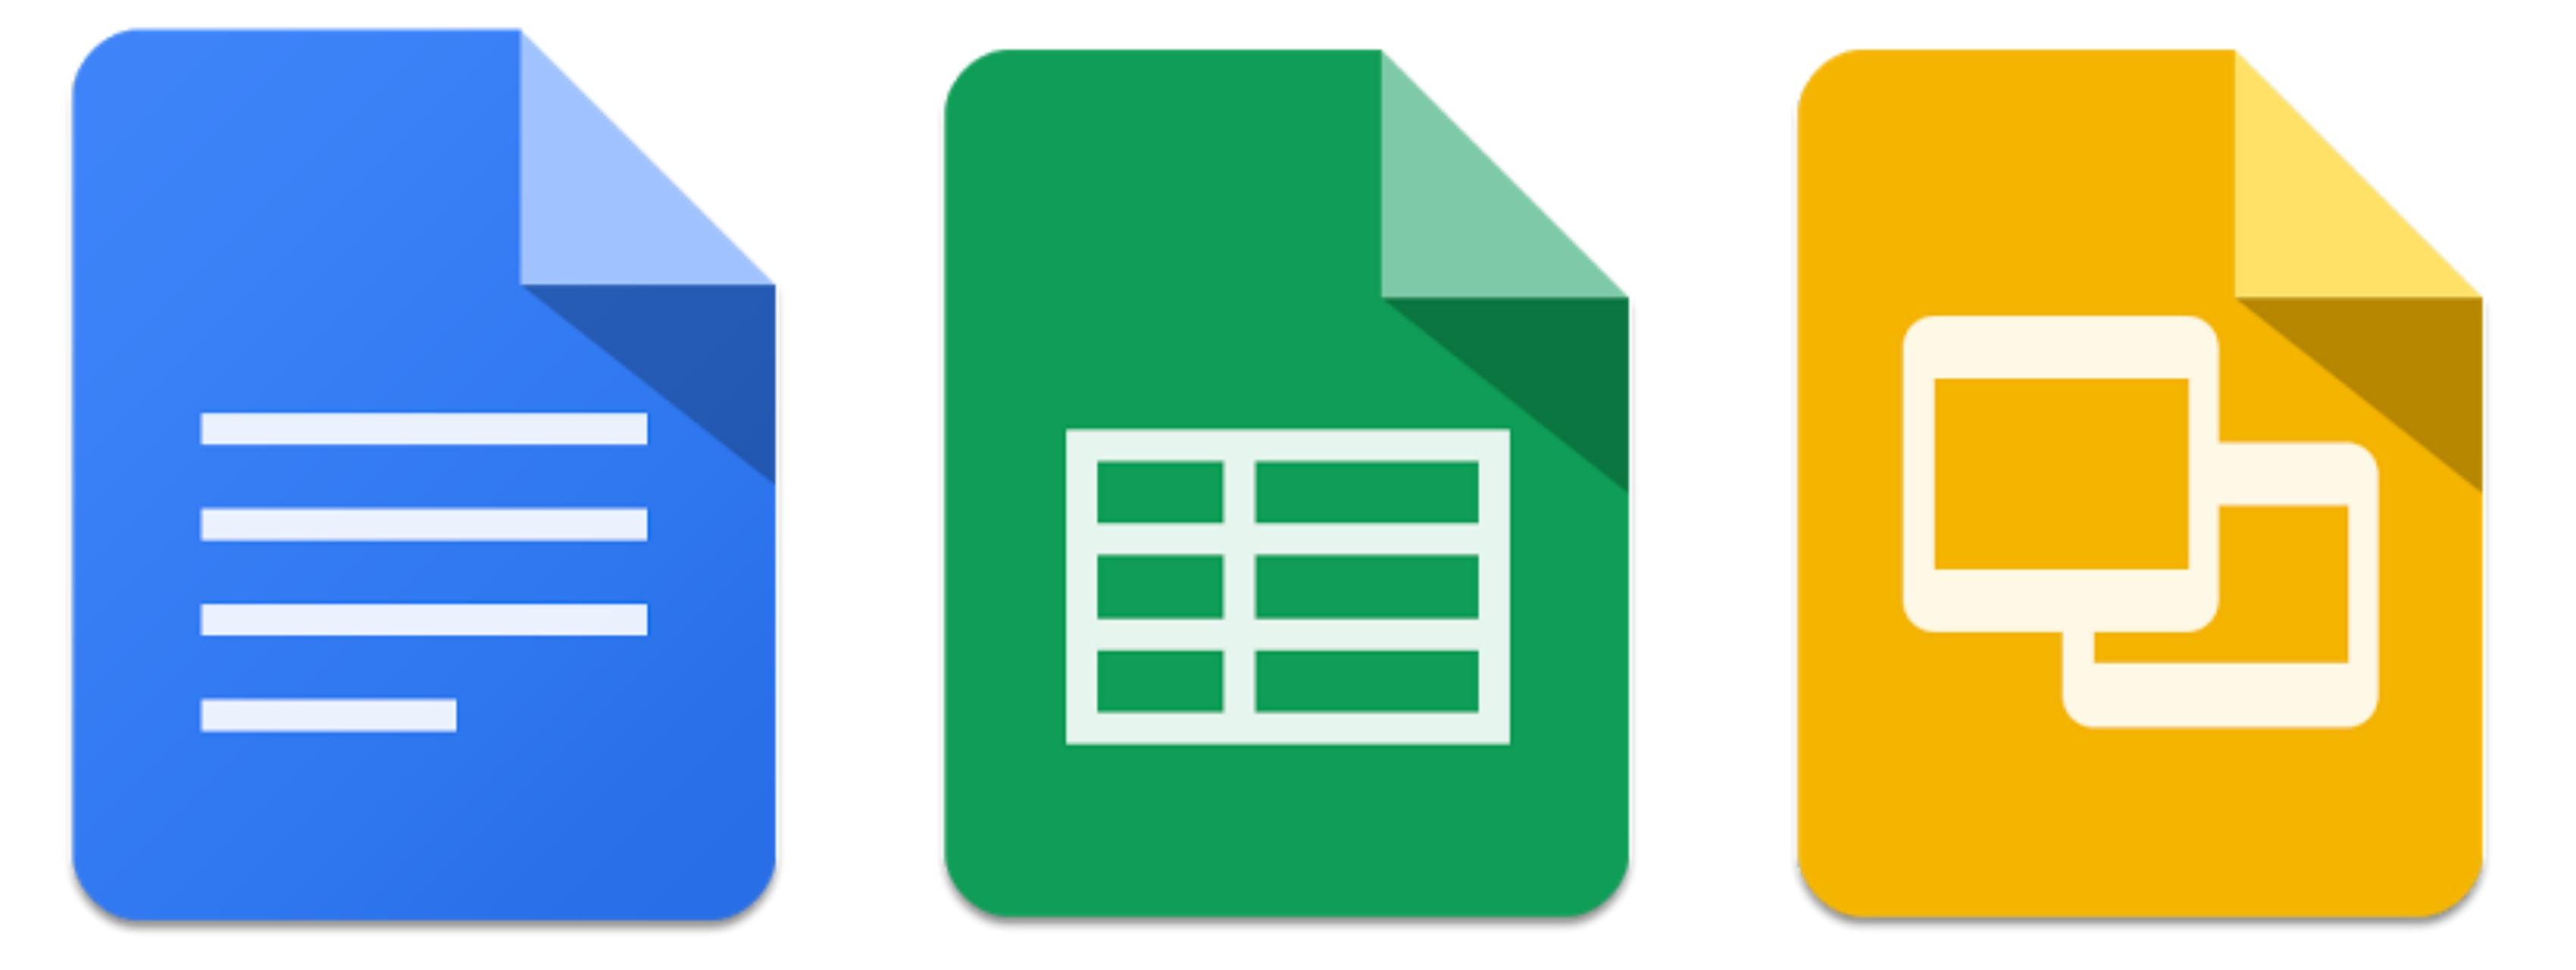 microsoft word, word processor, google earth, portable document format, google calendar, google maps, cloud computing, google sites, google apps, presentation program, on docs